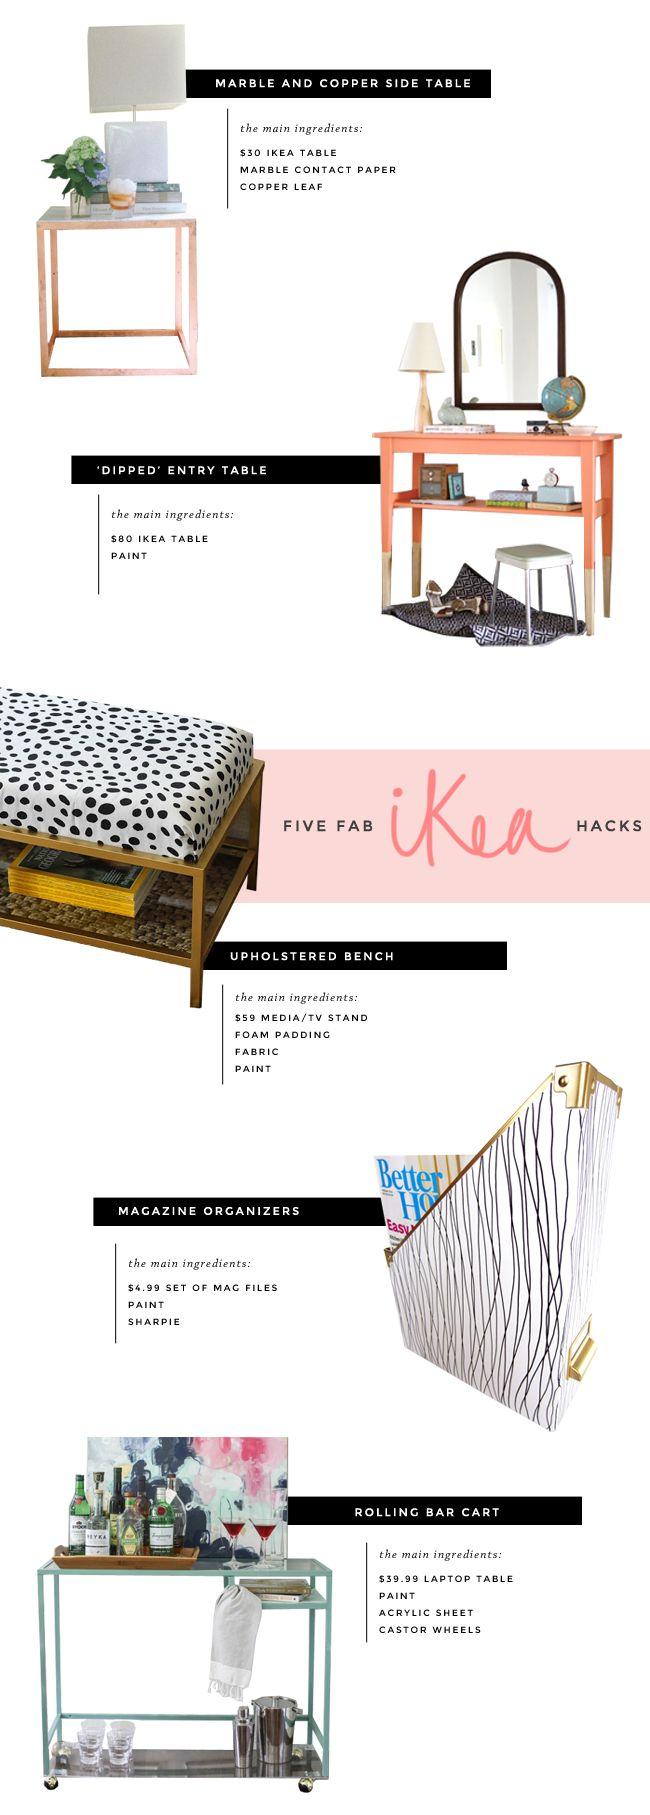 5 Ikea Hacks I Want to Try